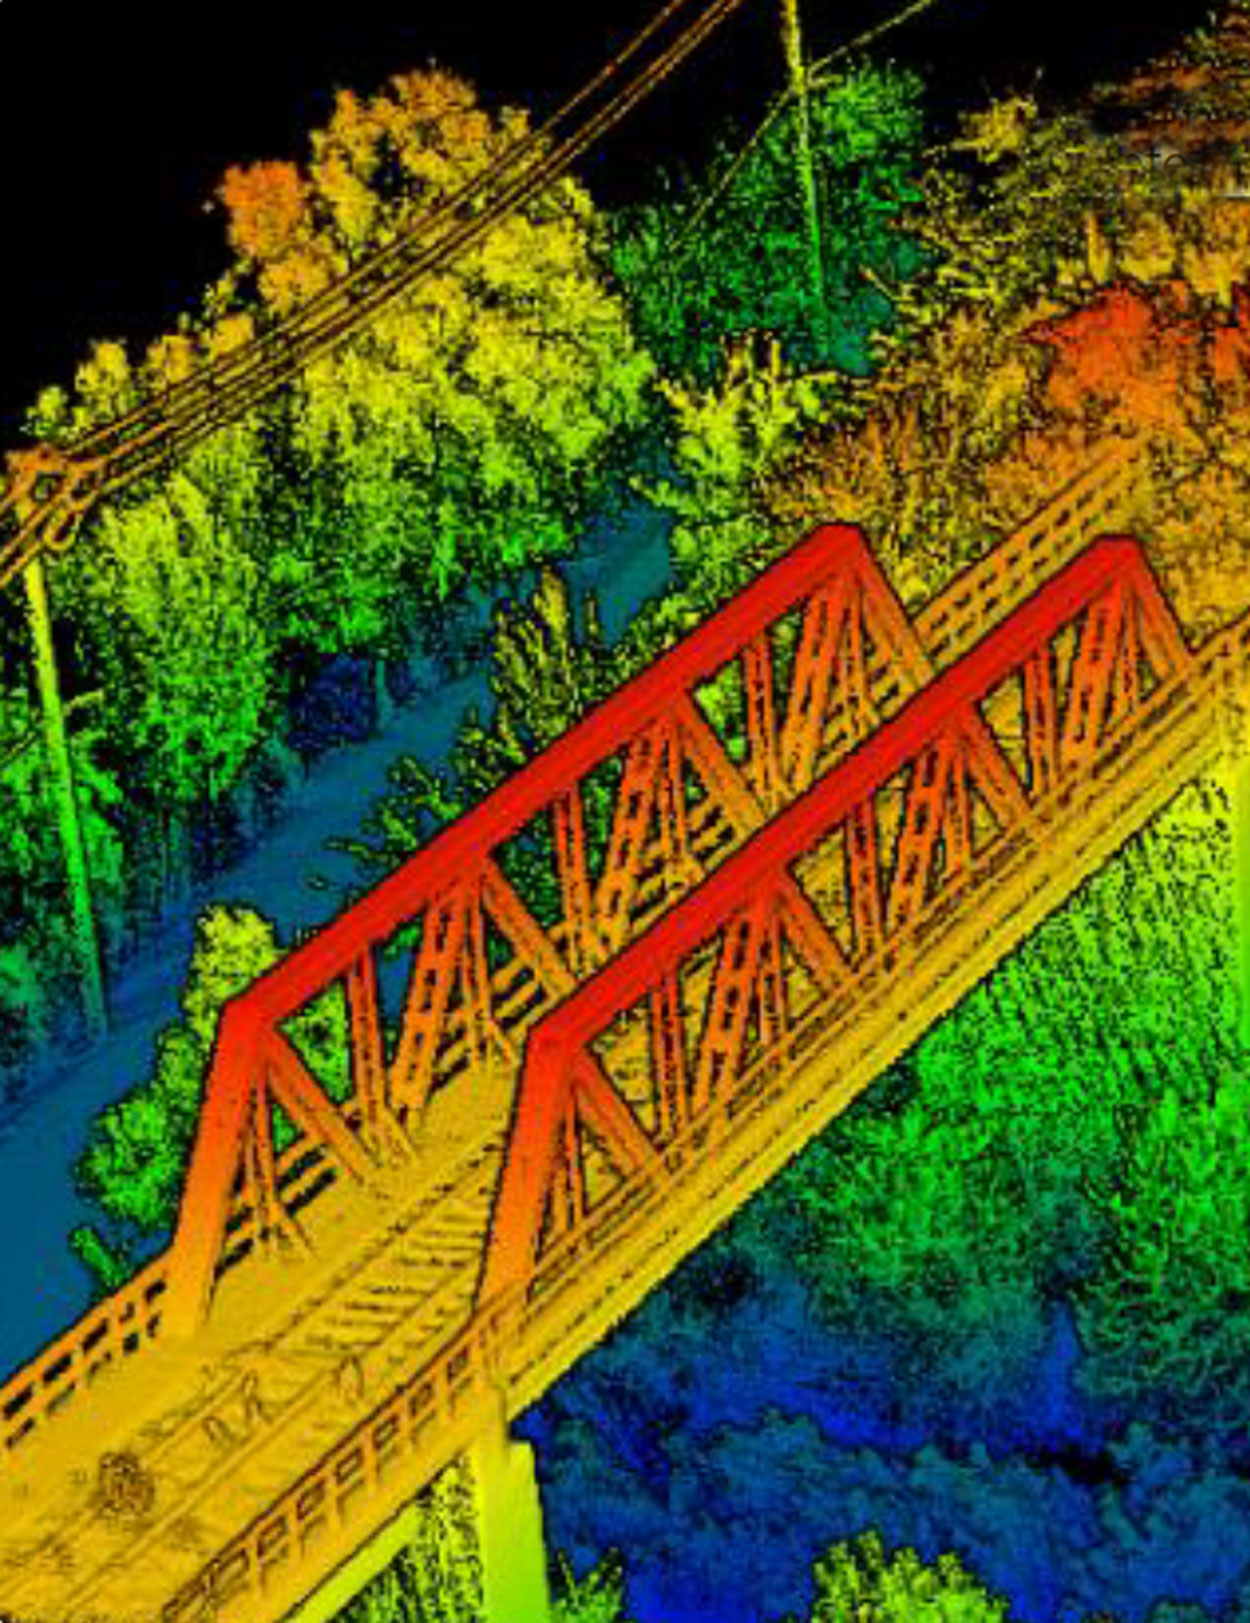 Lidar Image of a Bridge